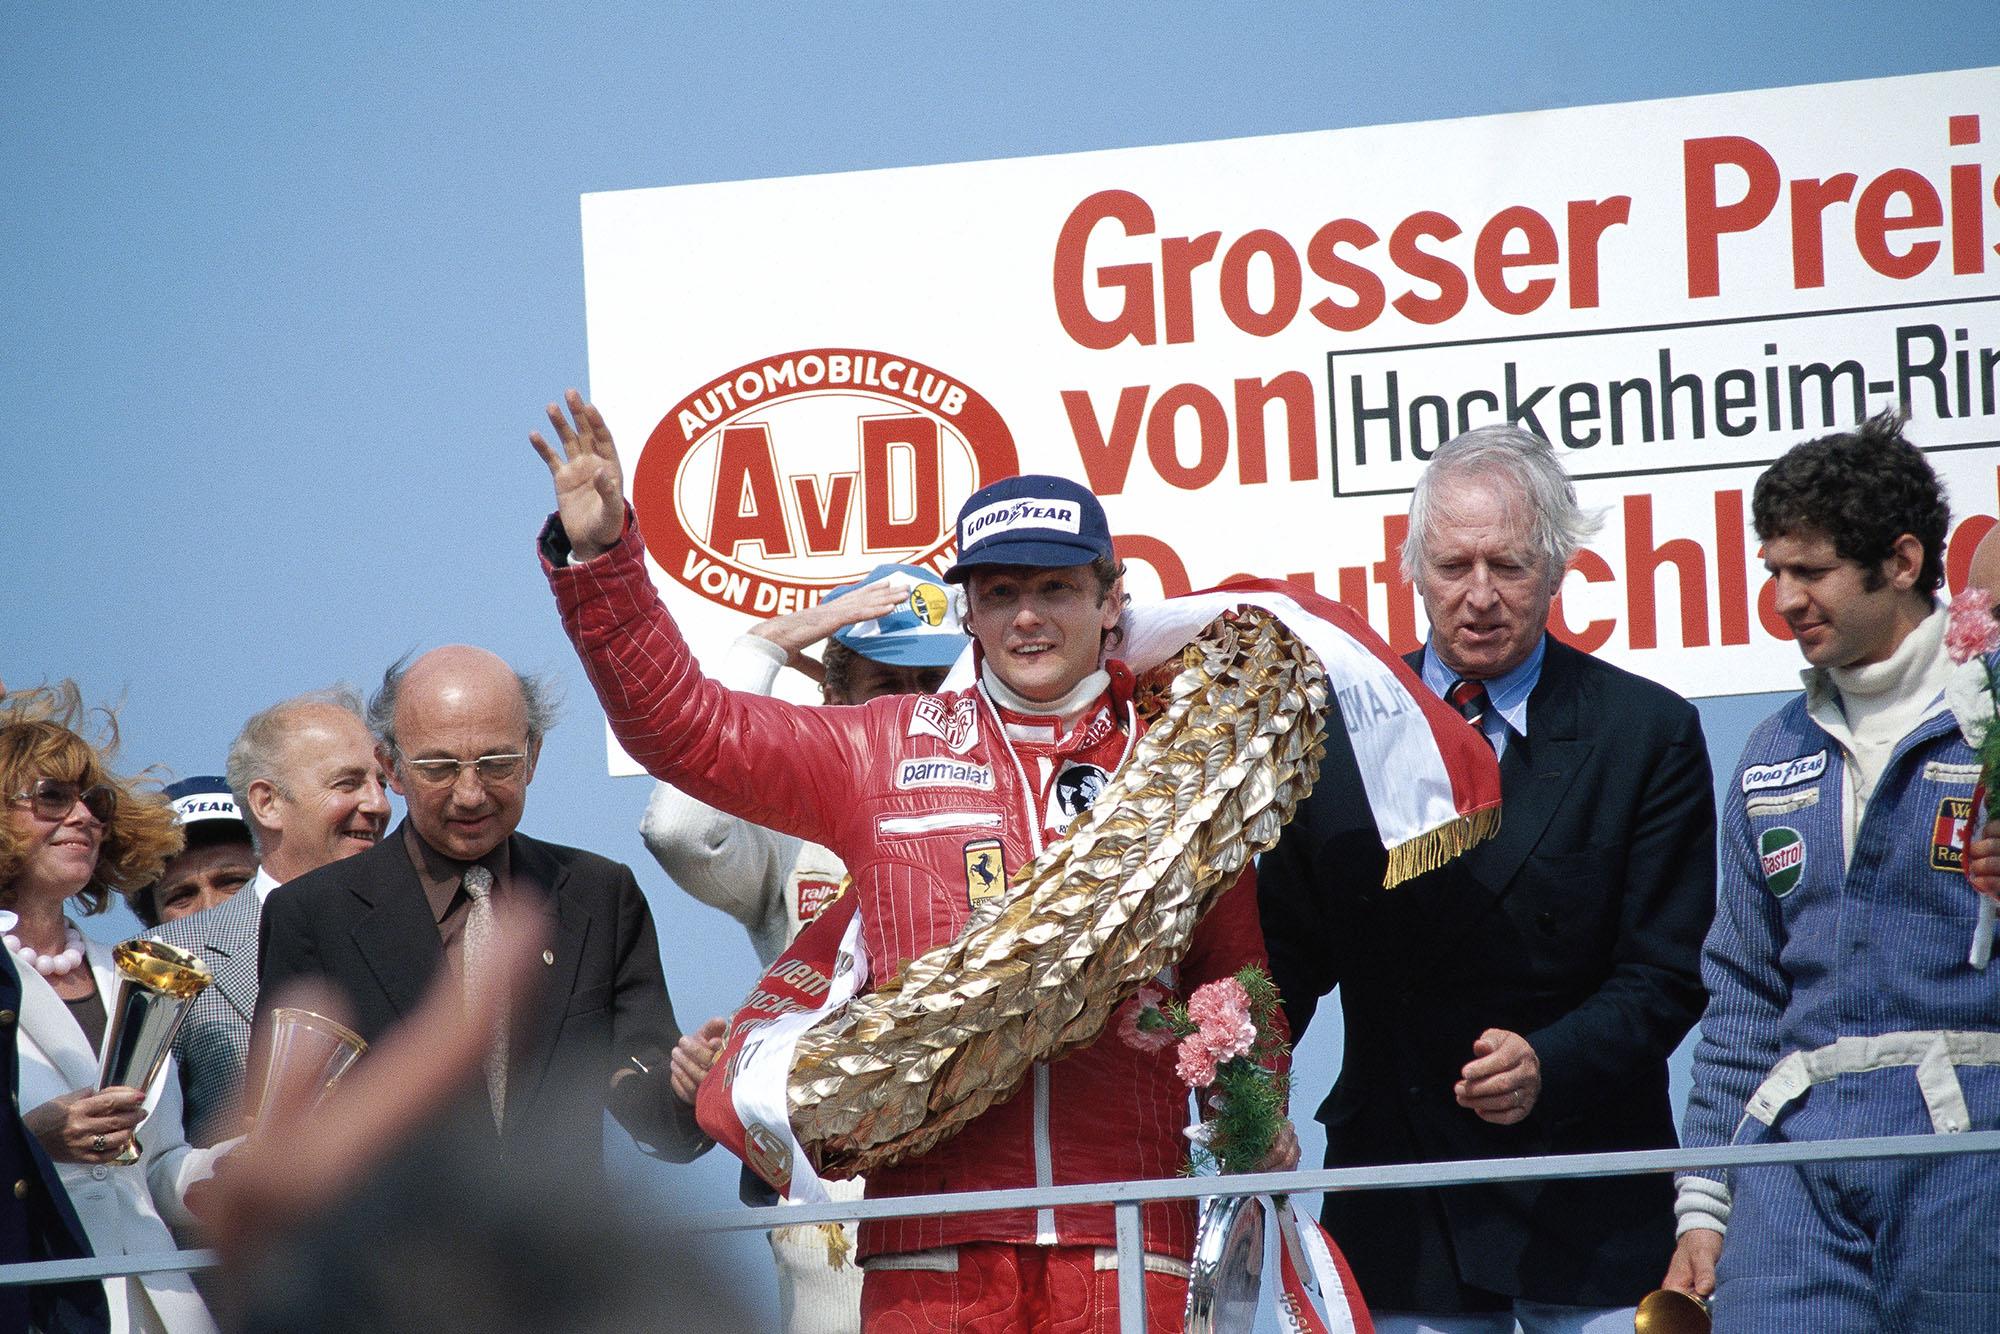 Niki Lauda waves to the crowd after winning the 1977 German Grand Prix, Hockenheim.